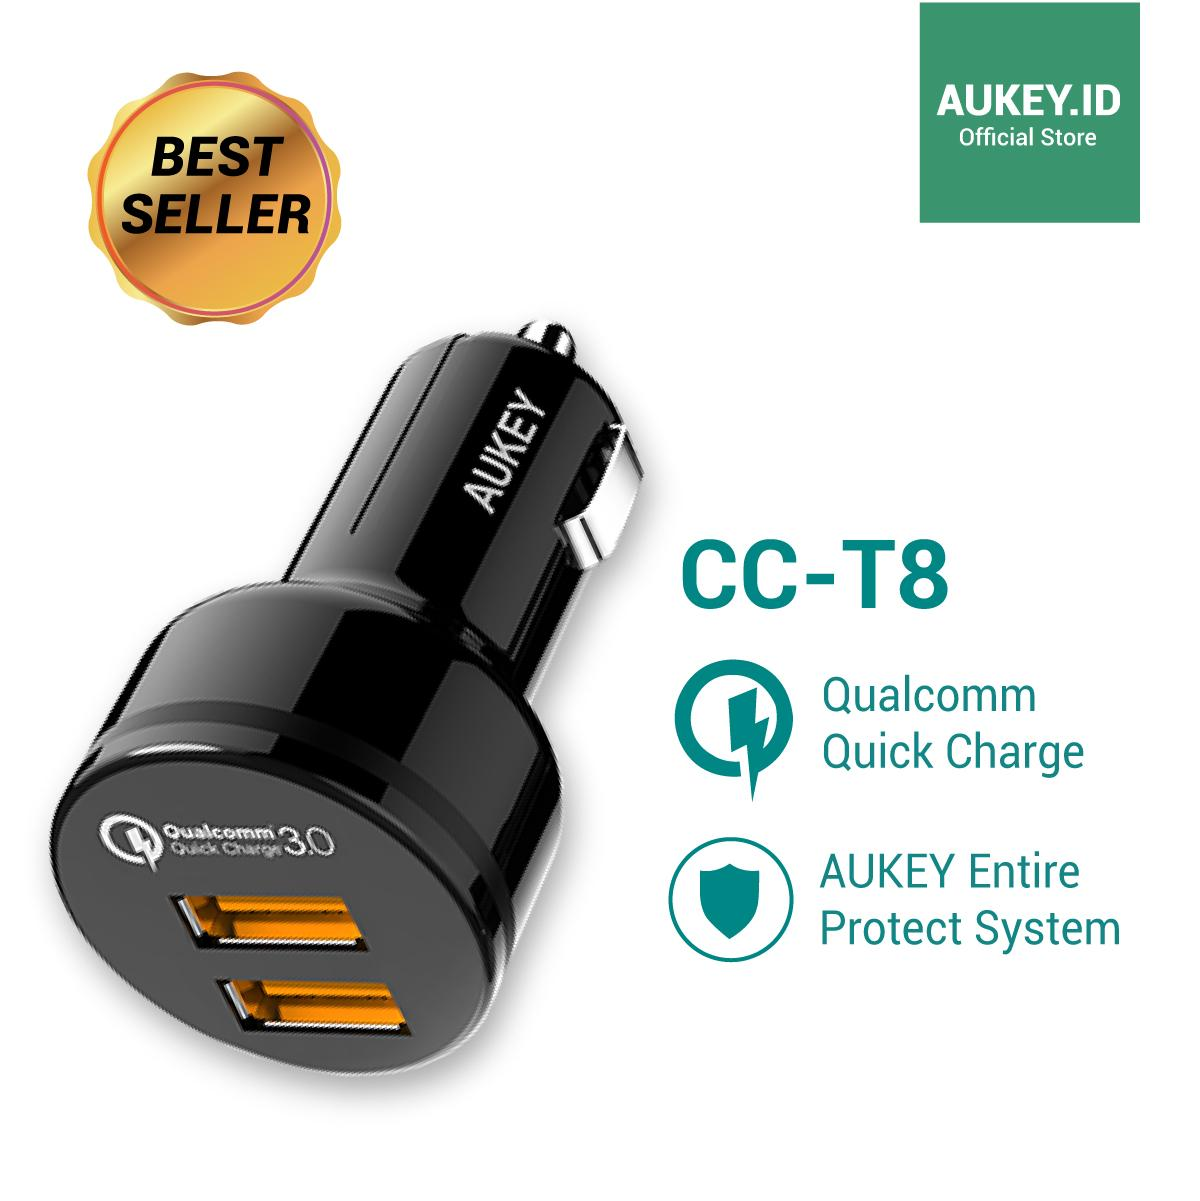 [STOCK TERBATAS] Aukey Car Charger CC-T8 Qualcomm Technology - 2 Ports (. Ke Toko